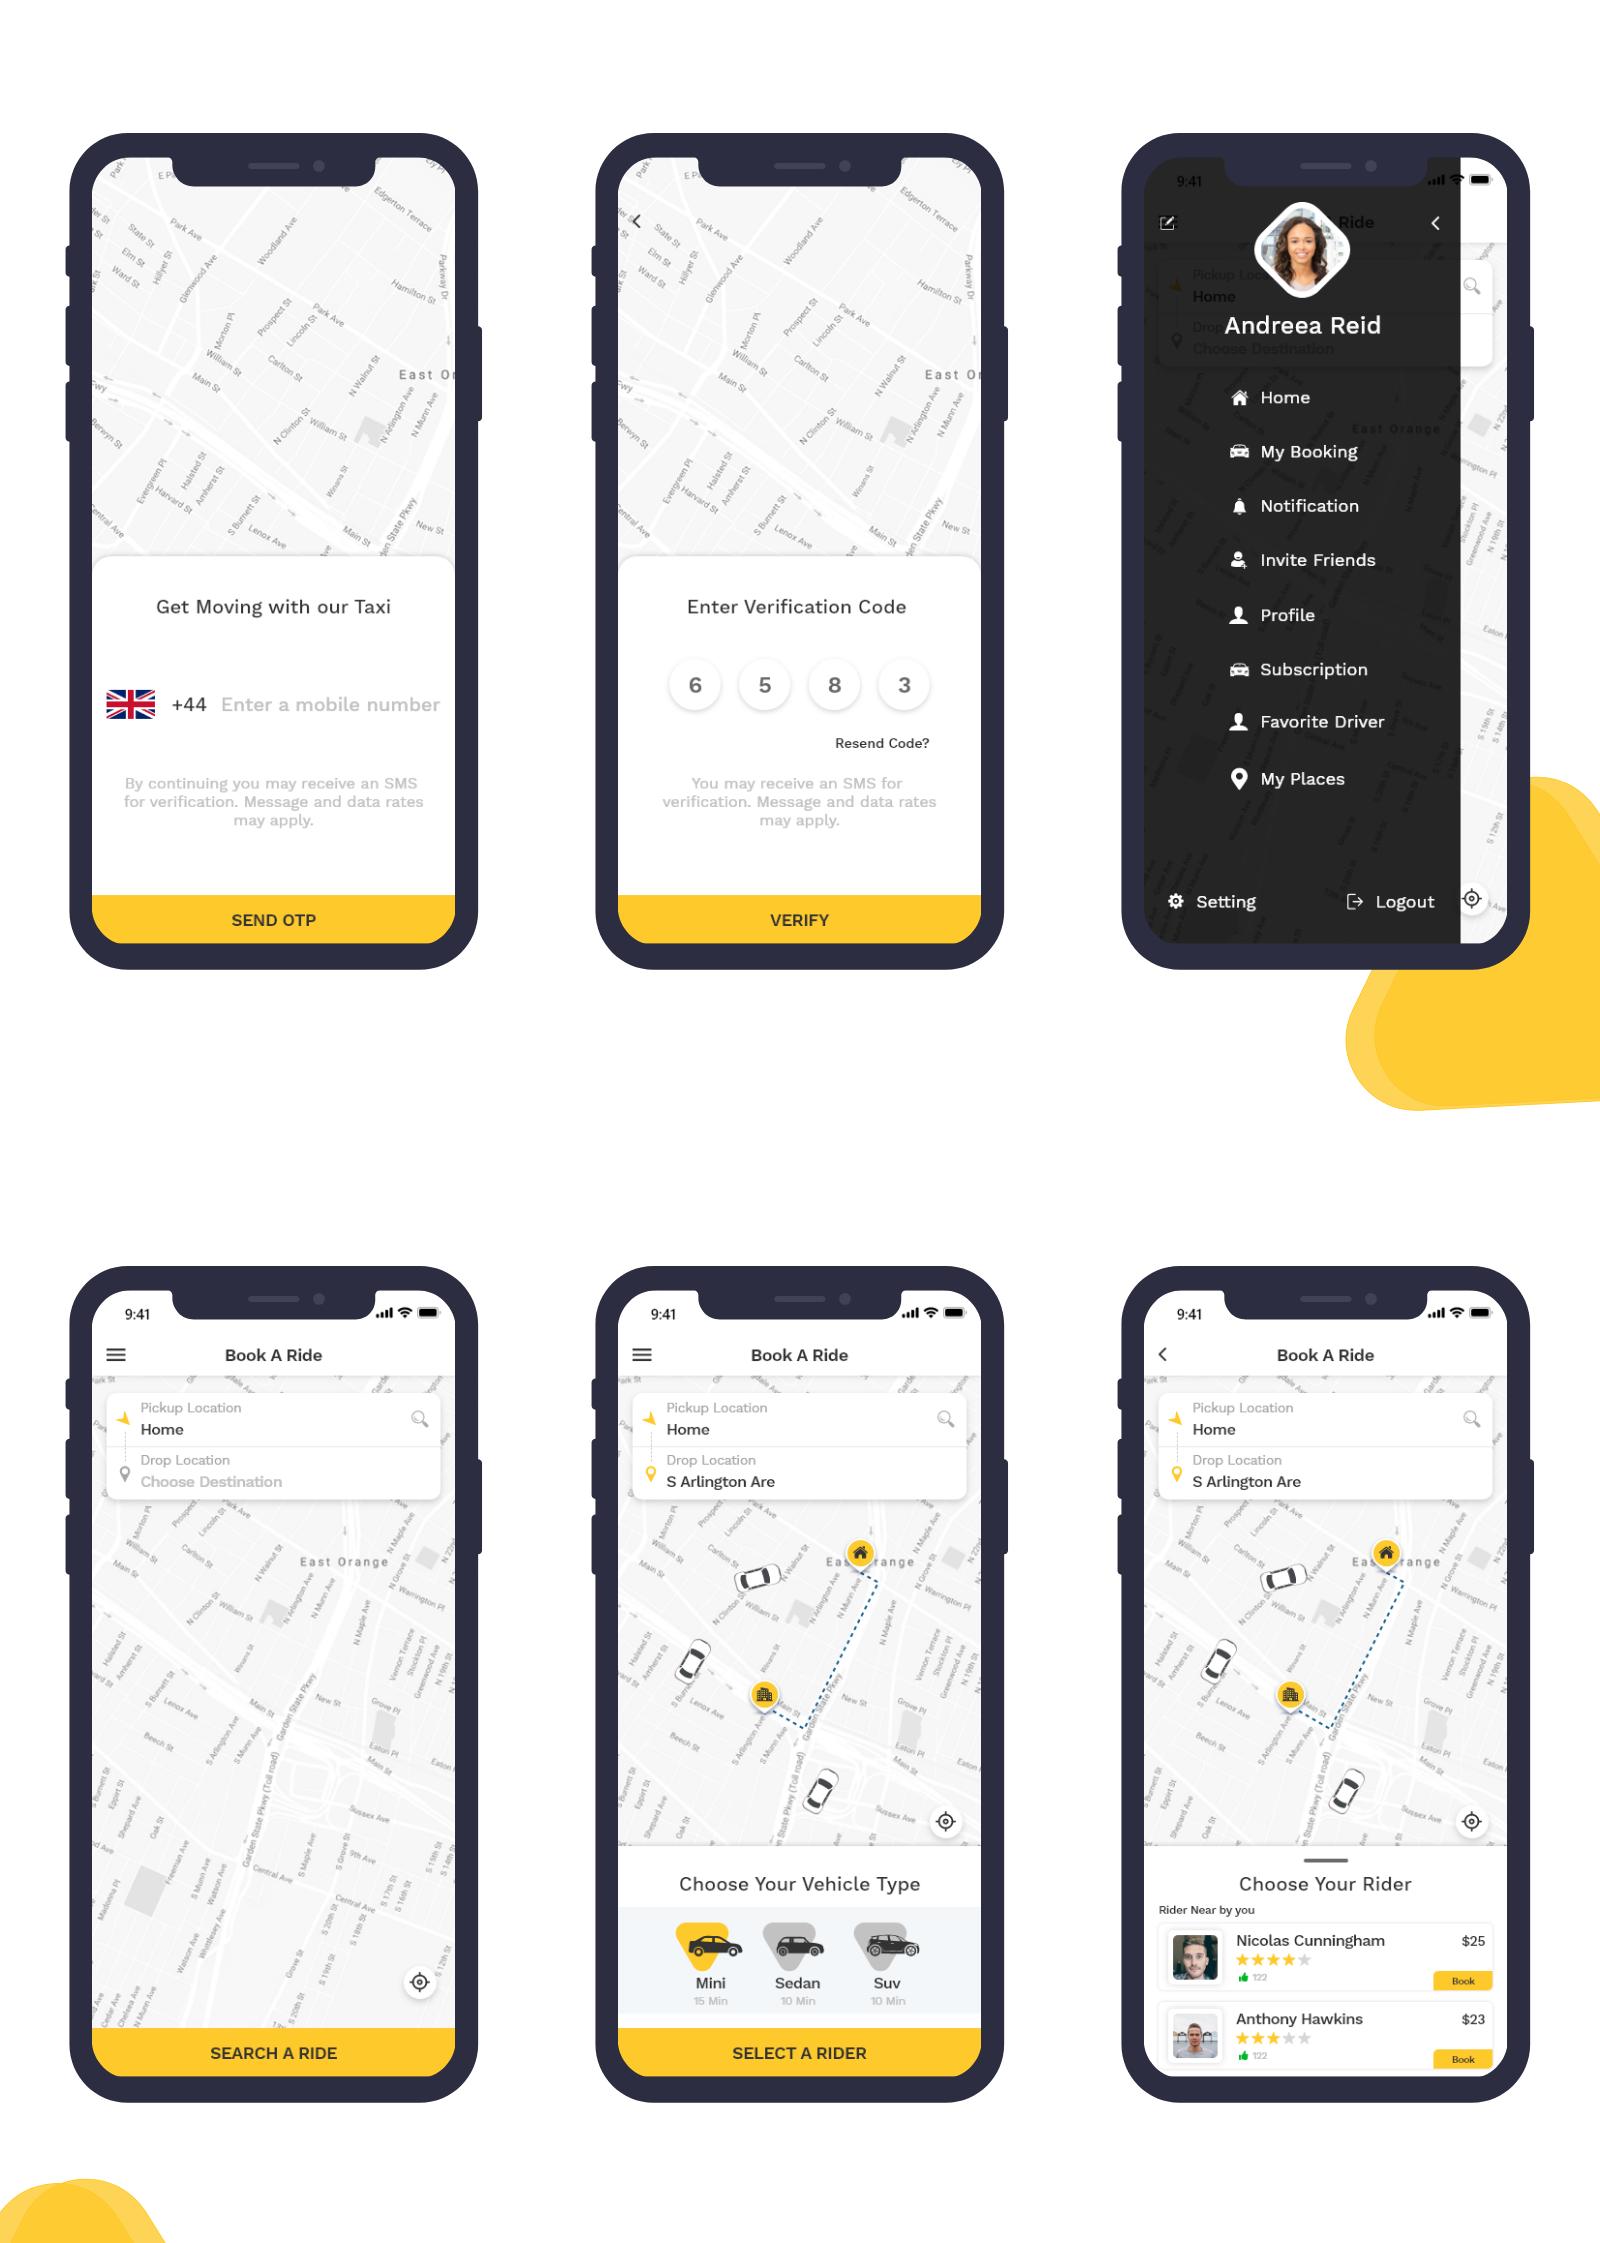 Citycab-ola-uber-taxi-booking-app-2